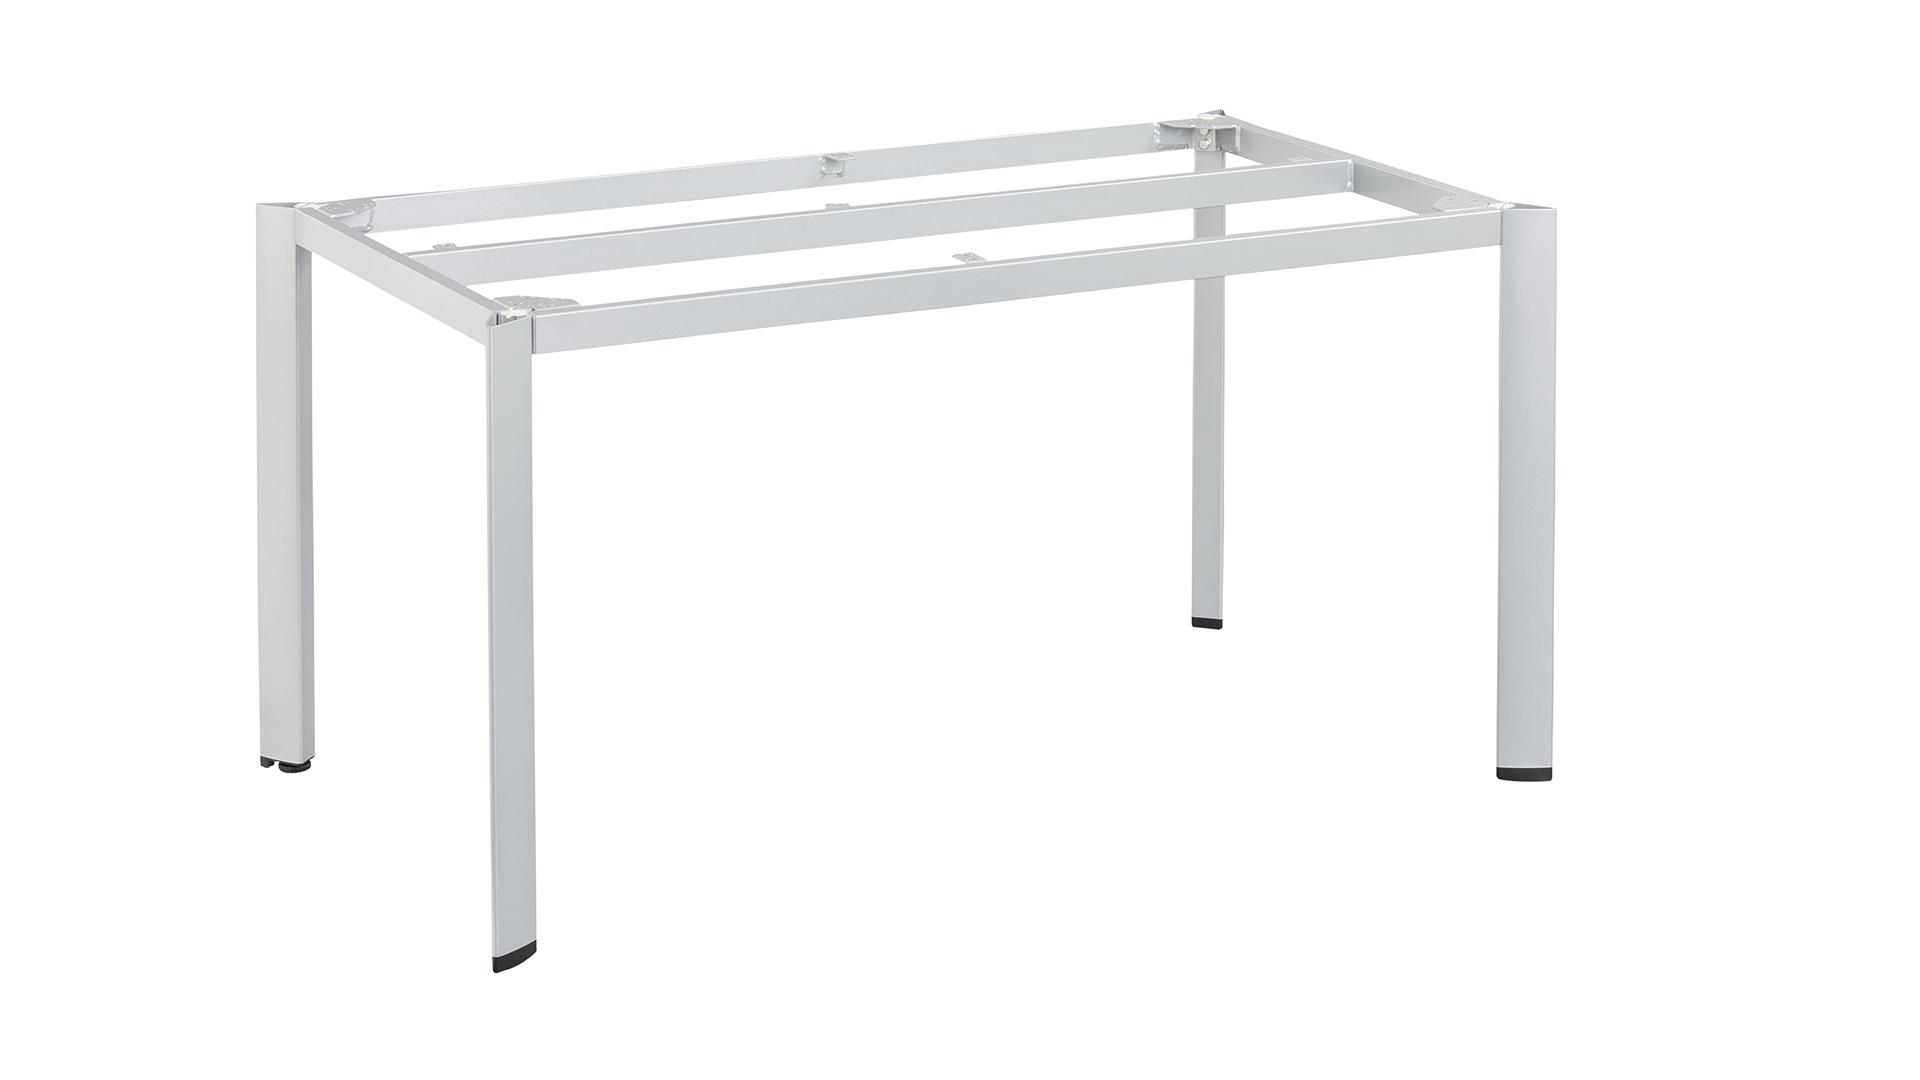 EDGE Tischgestell 140 x 70 cm